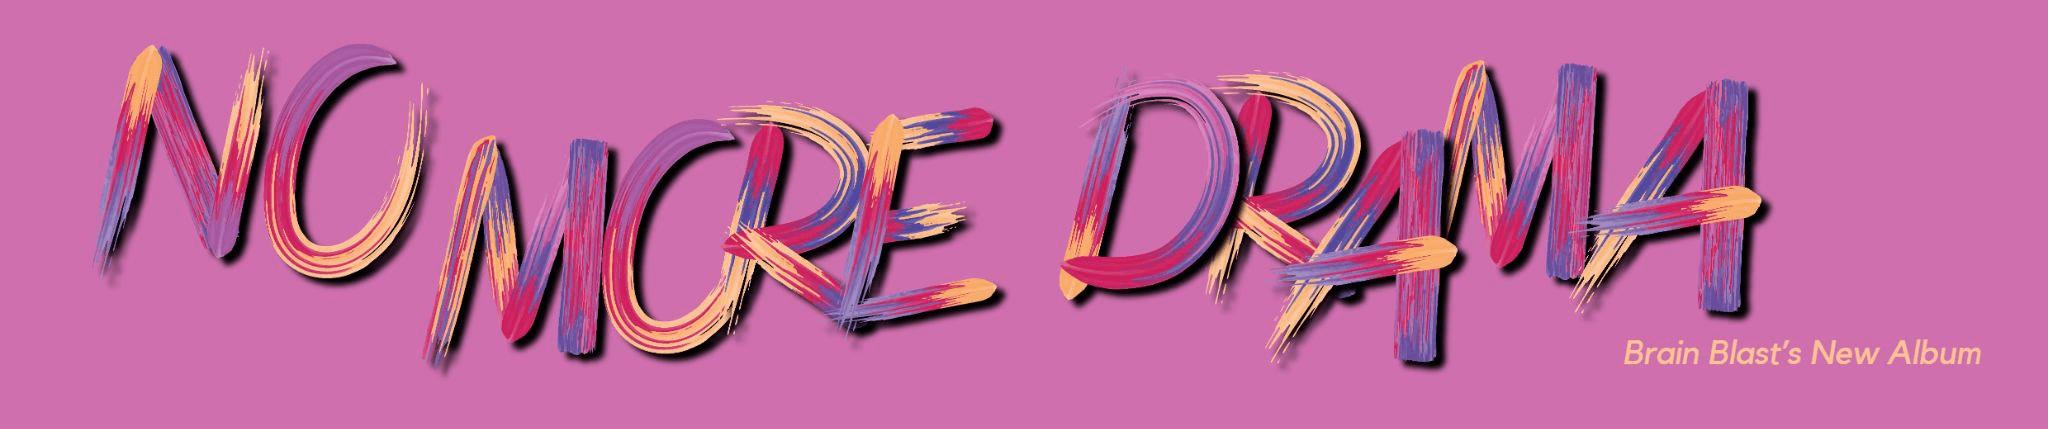 Fotor pink SoundCloud banner template